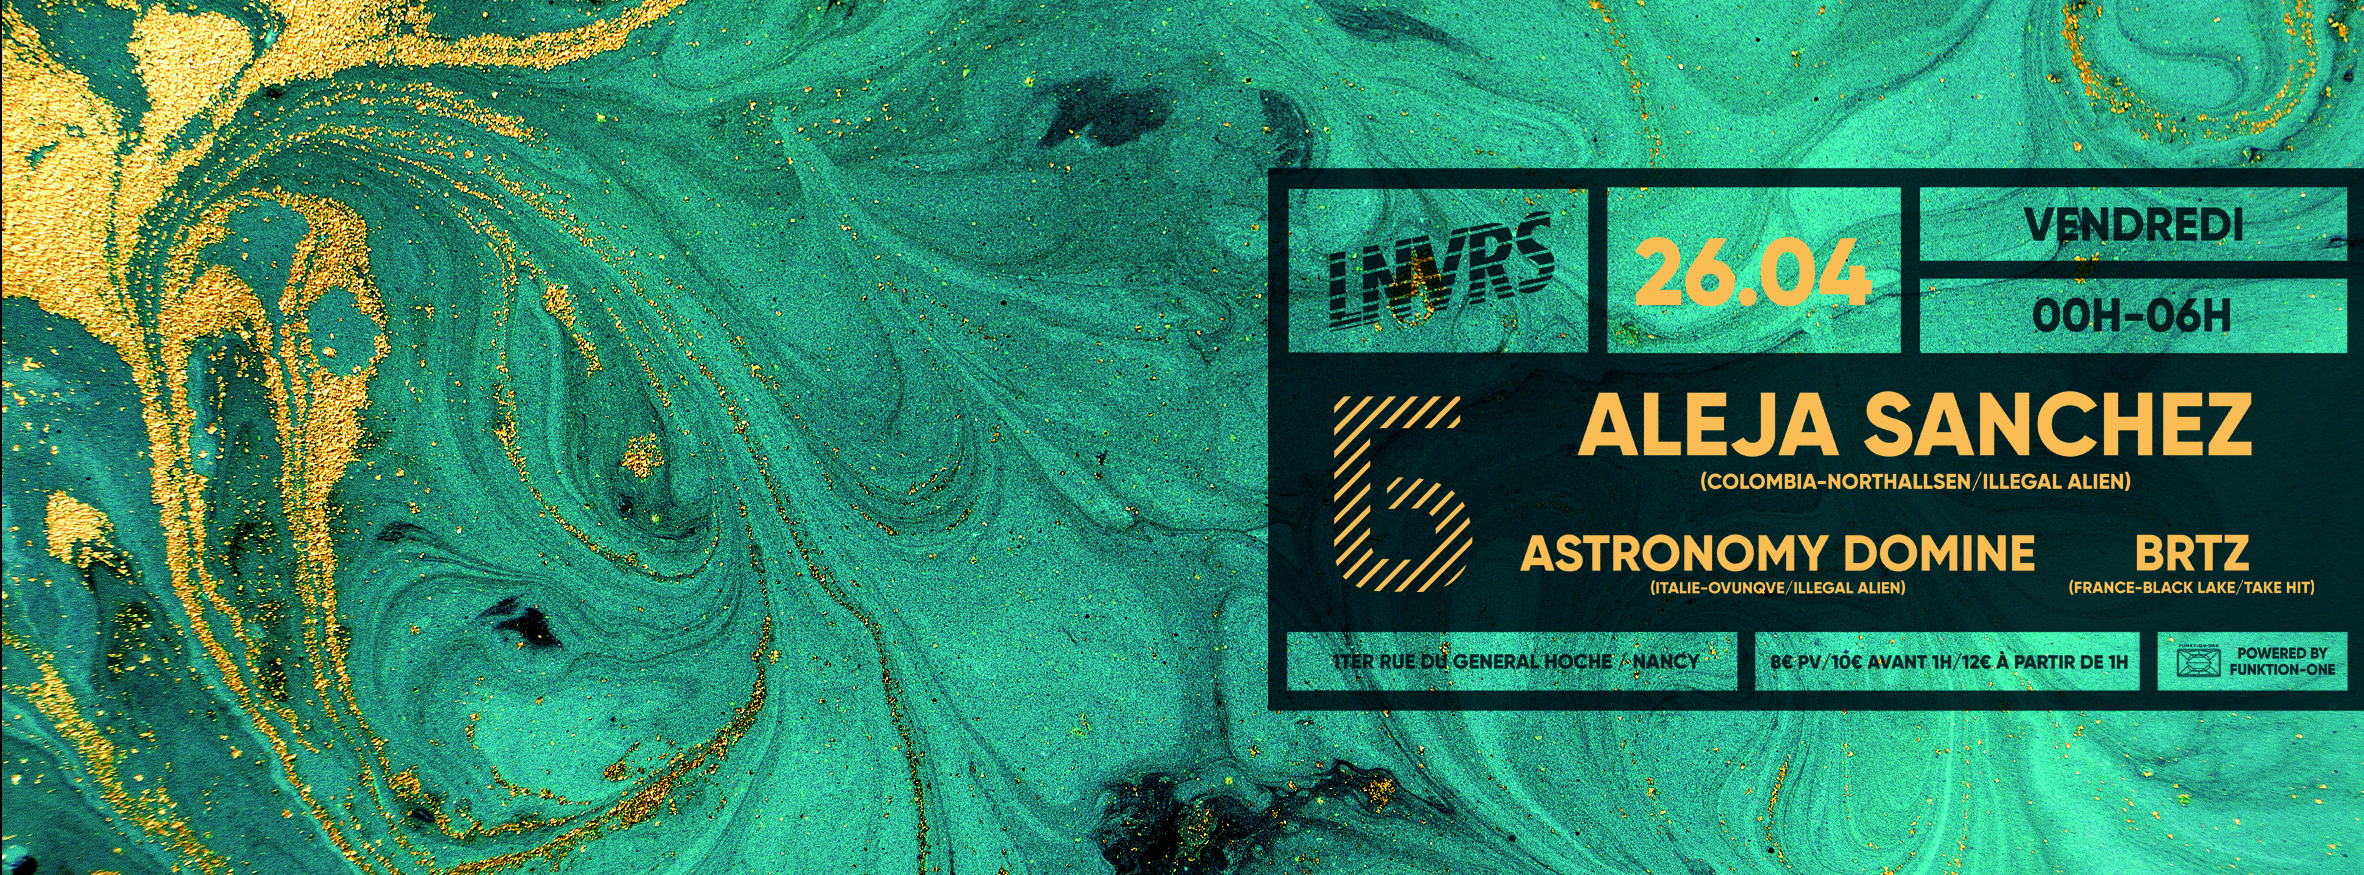 Bliss - Б x LNVRS w/ Aleja Sanchez [Northallsen, Illegal Alien]